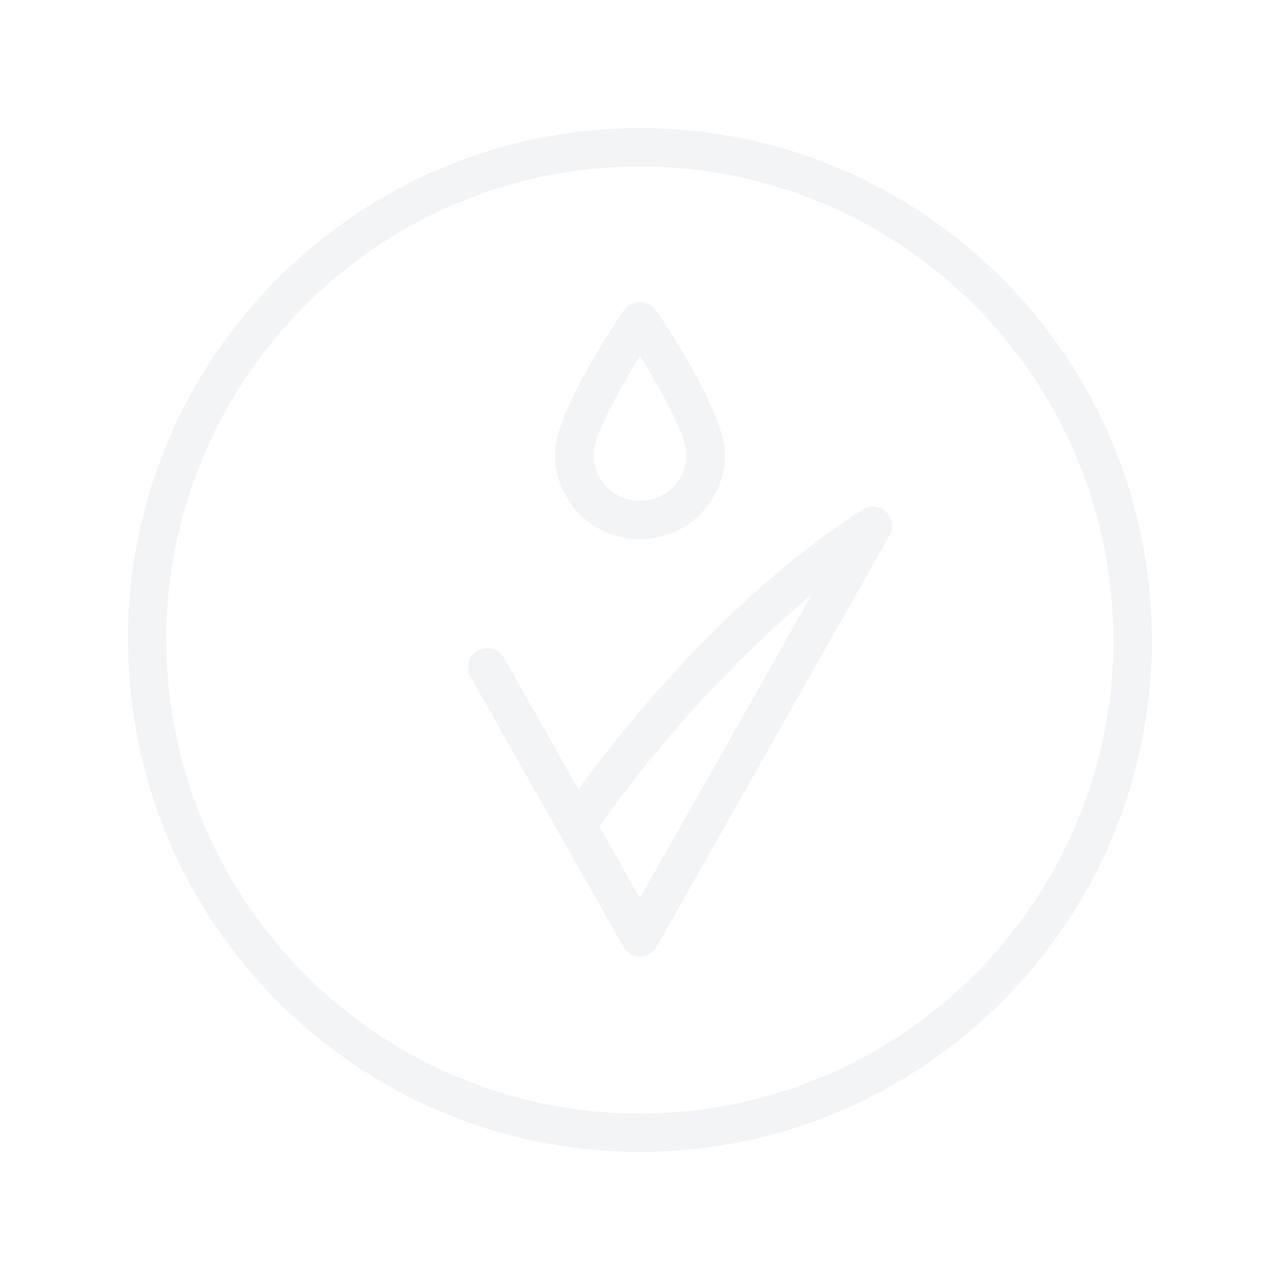 Elizabeth Arden Flawless Finish Perfectly Nude Makeup SPF15 No.06 Warm Sunbeige 30ml